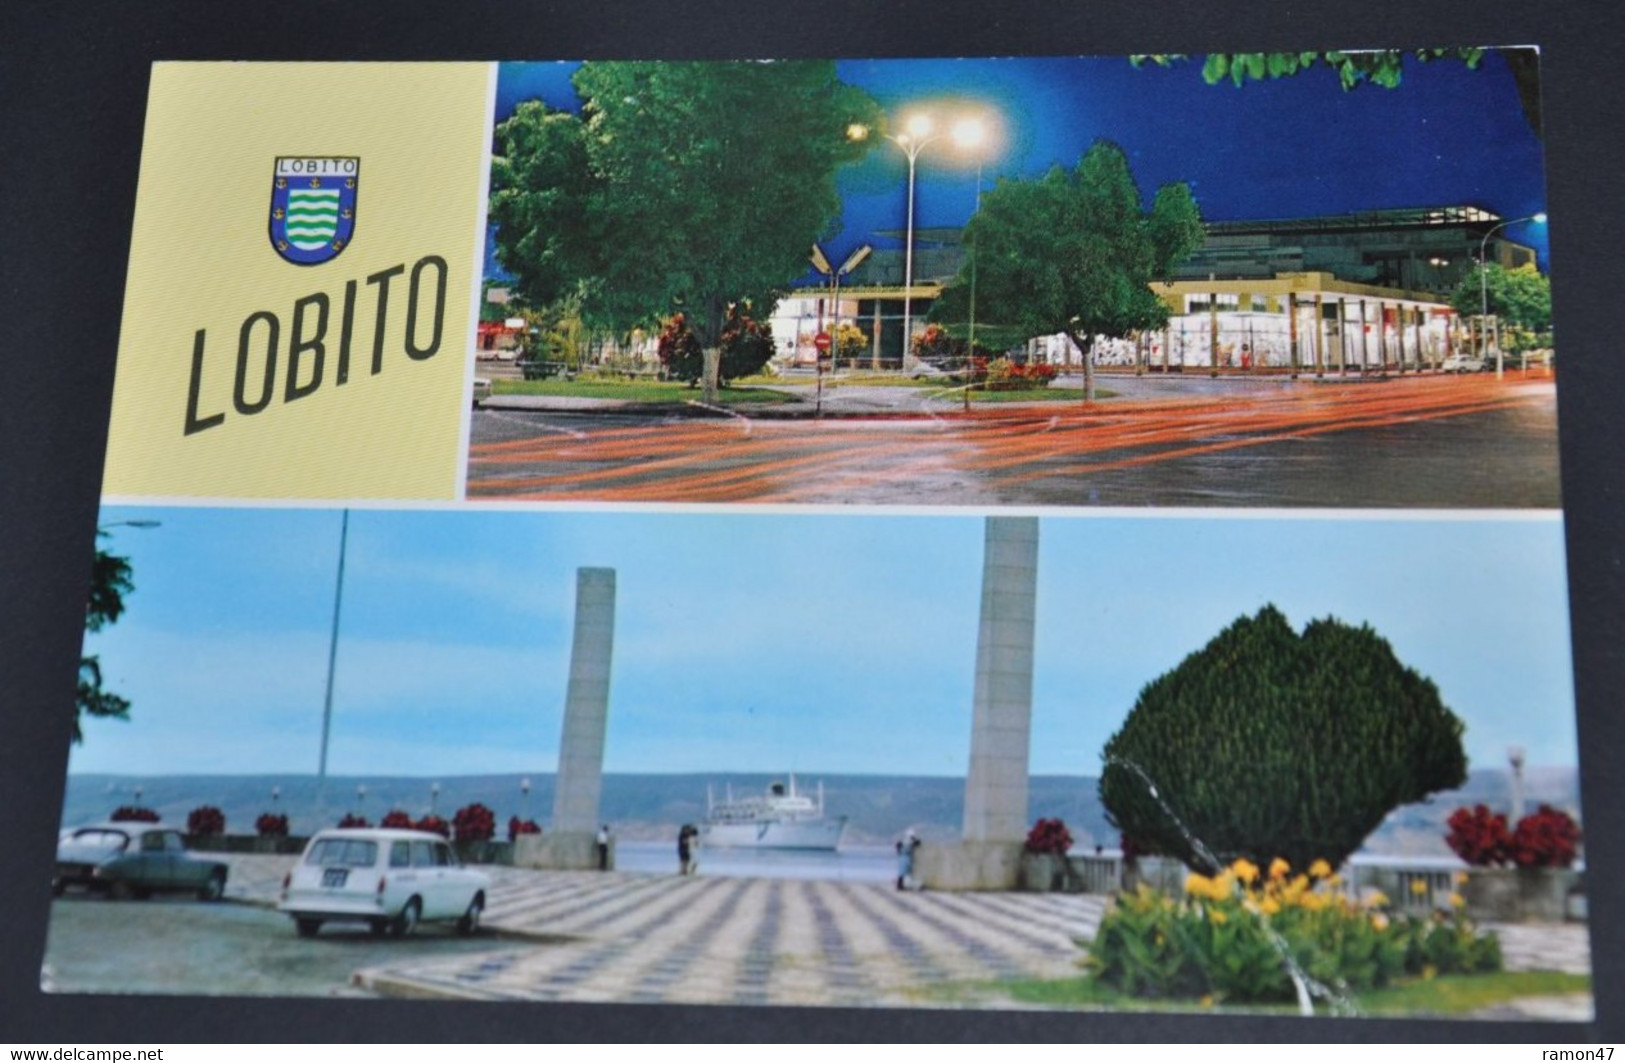 Lobito - Angola